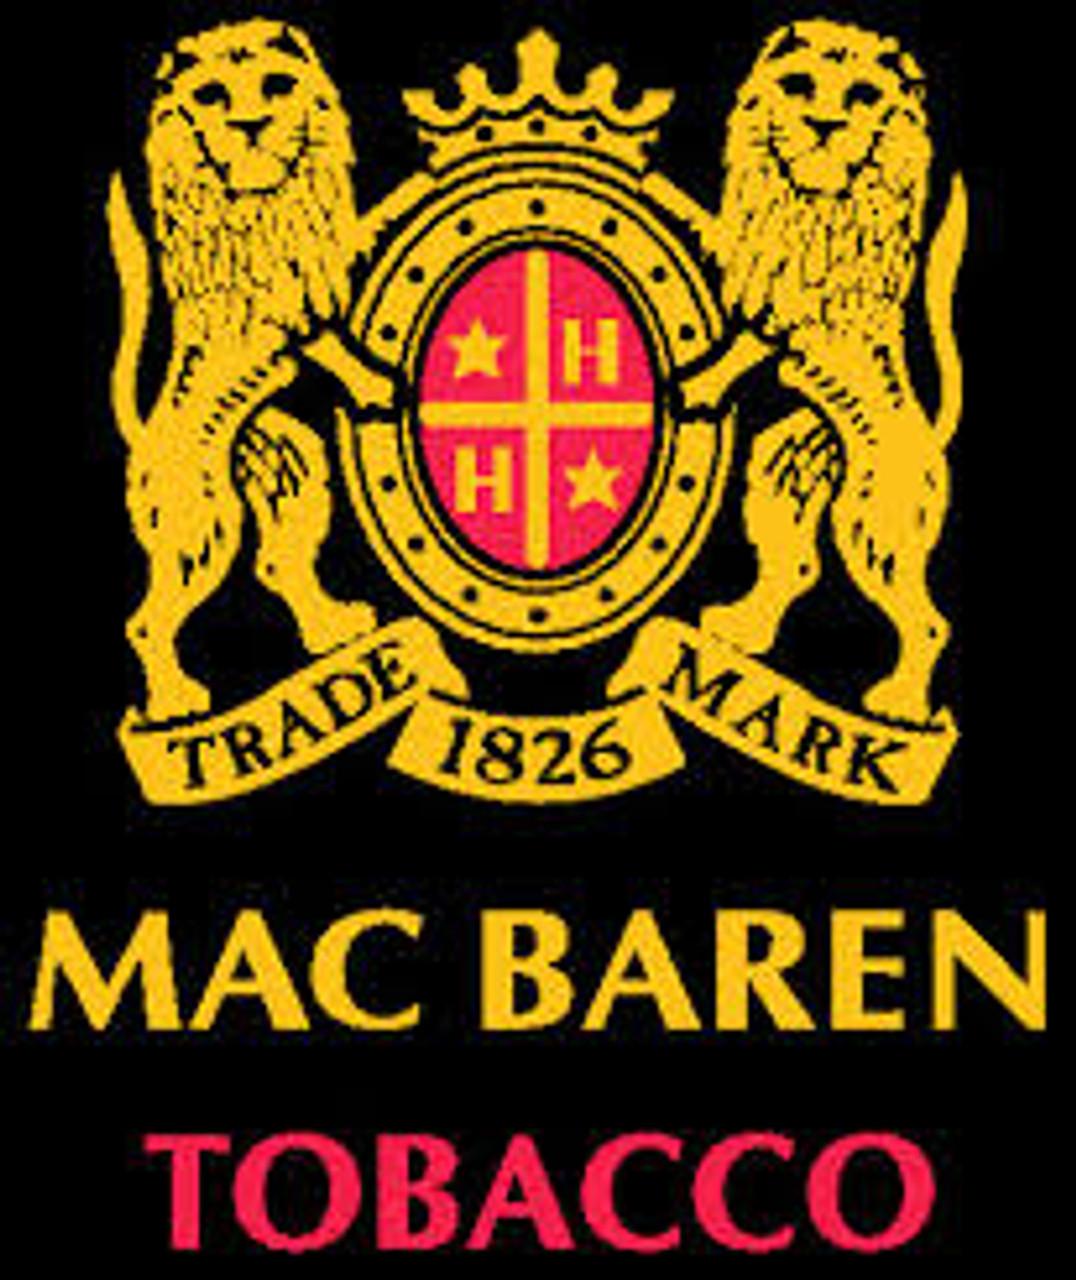 Mac Baren Virginia No.1 Pipe Tobacco | 16 OZ BAG